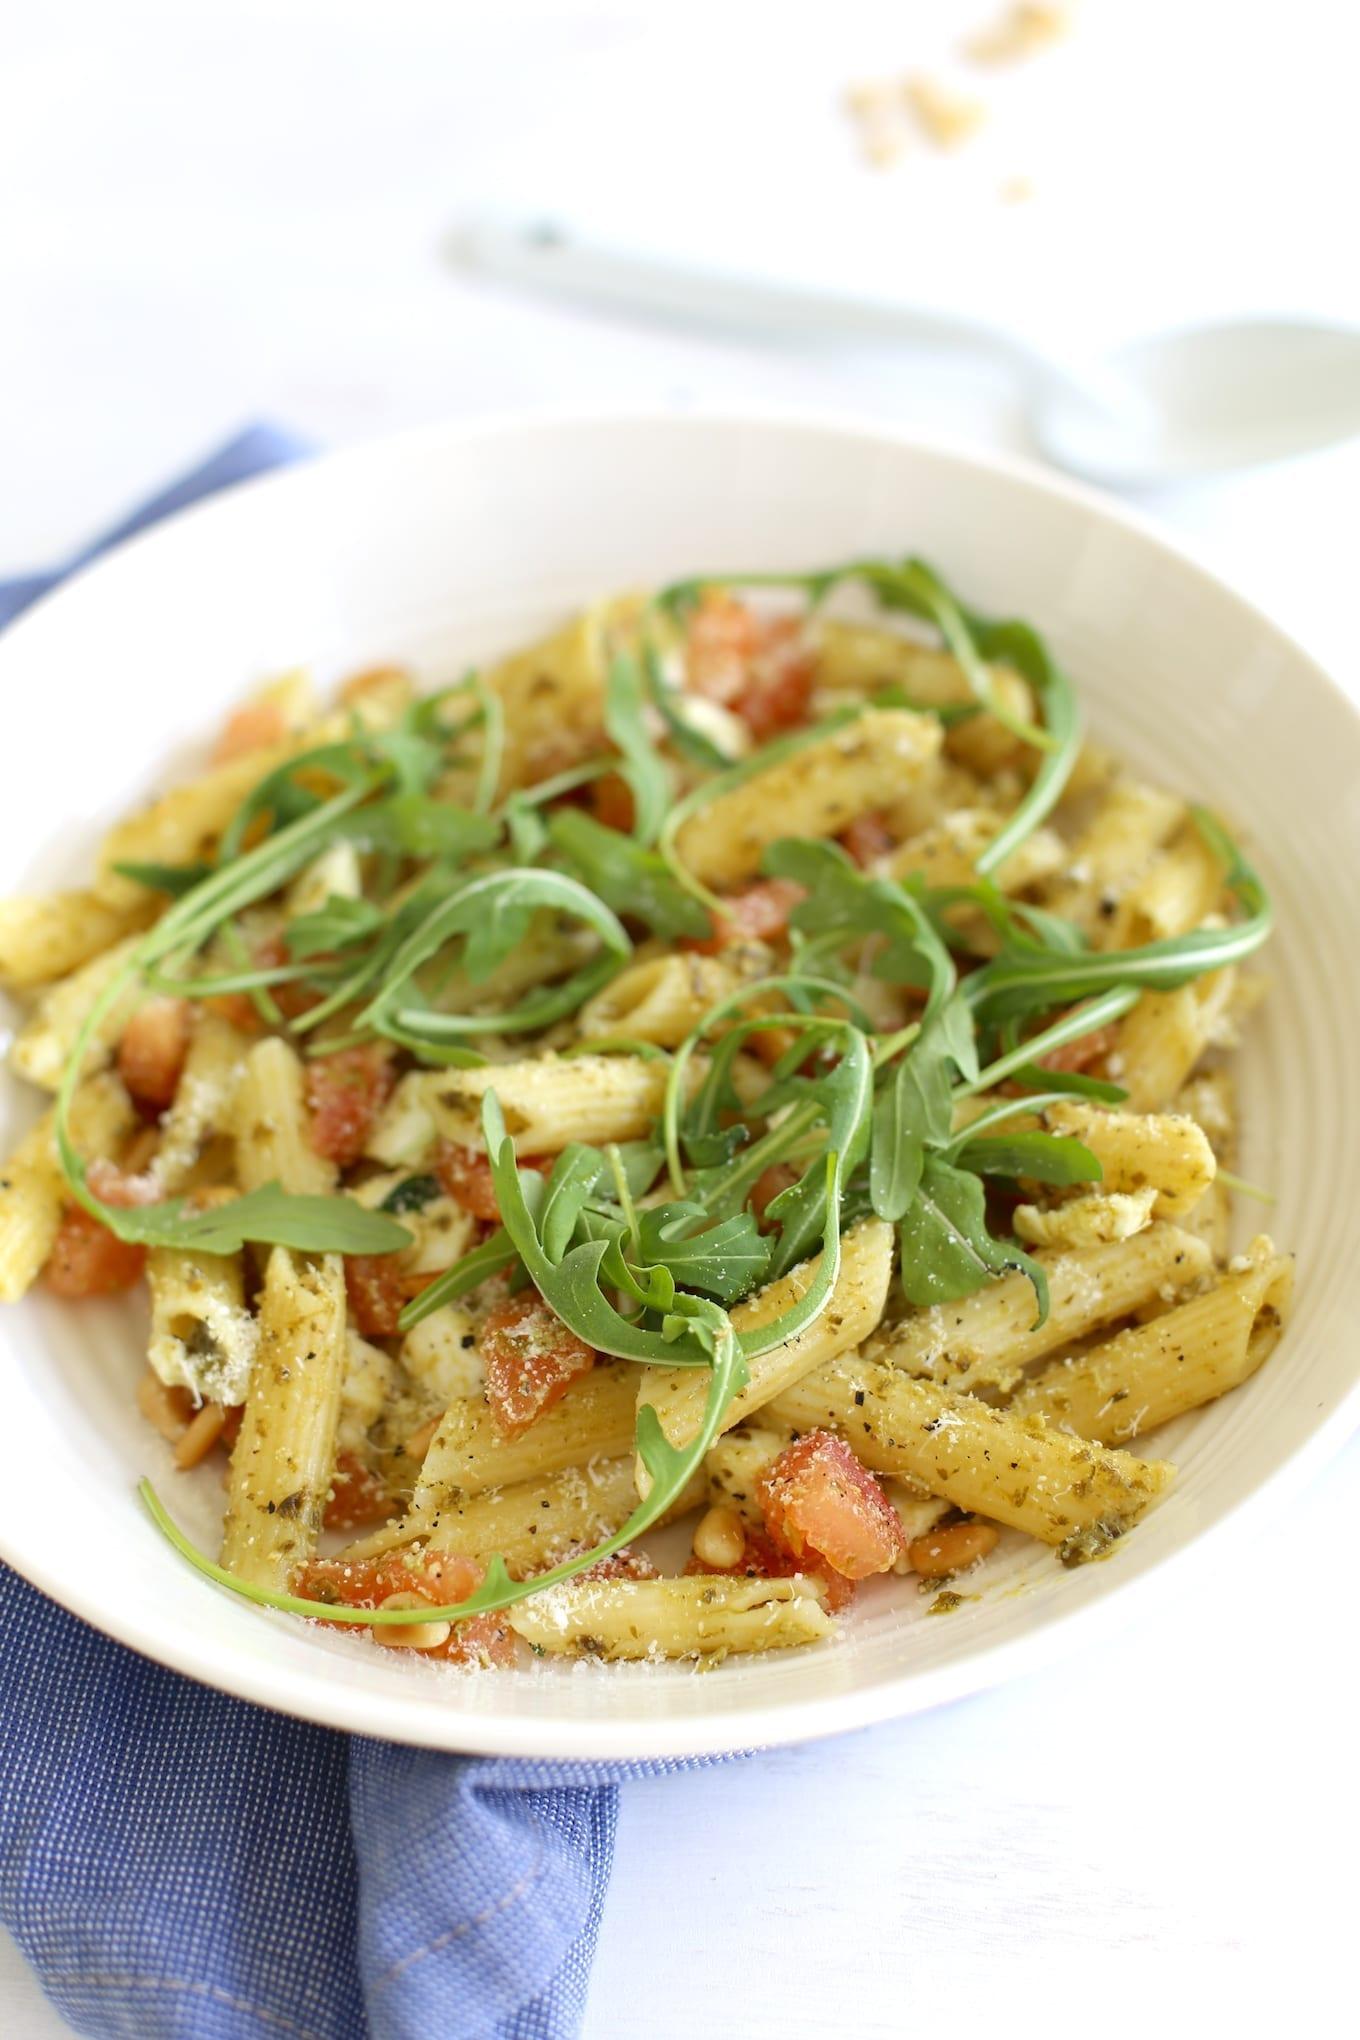 Caprese pastasalade